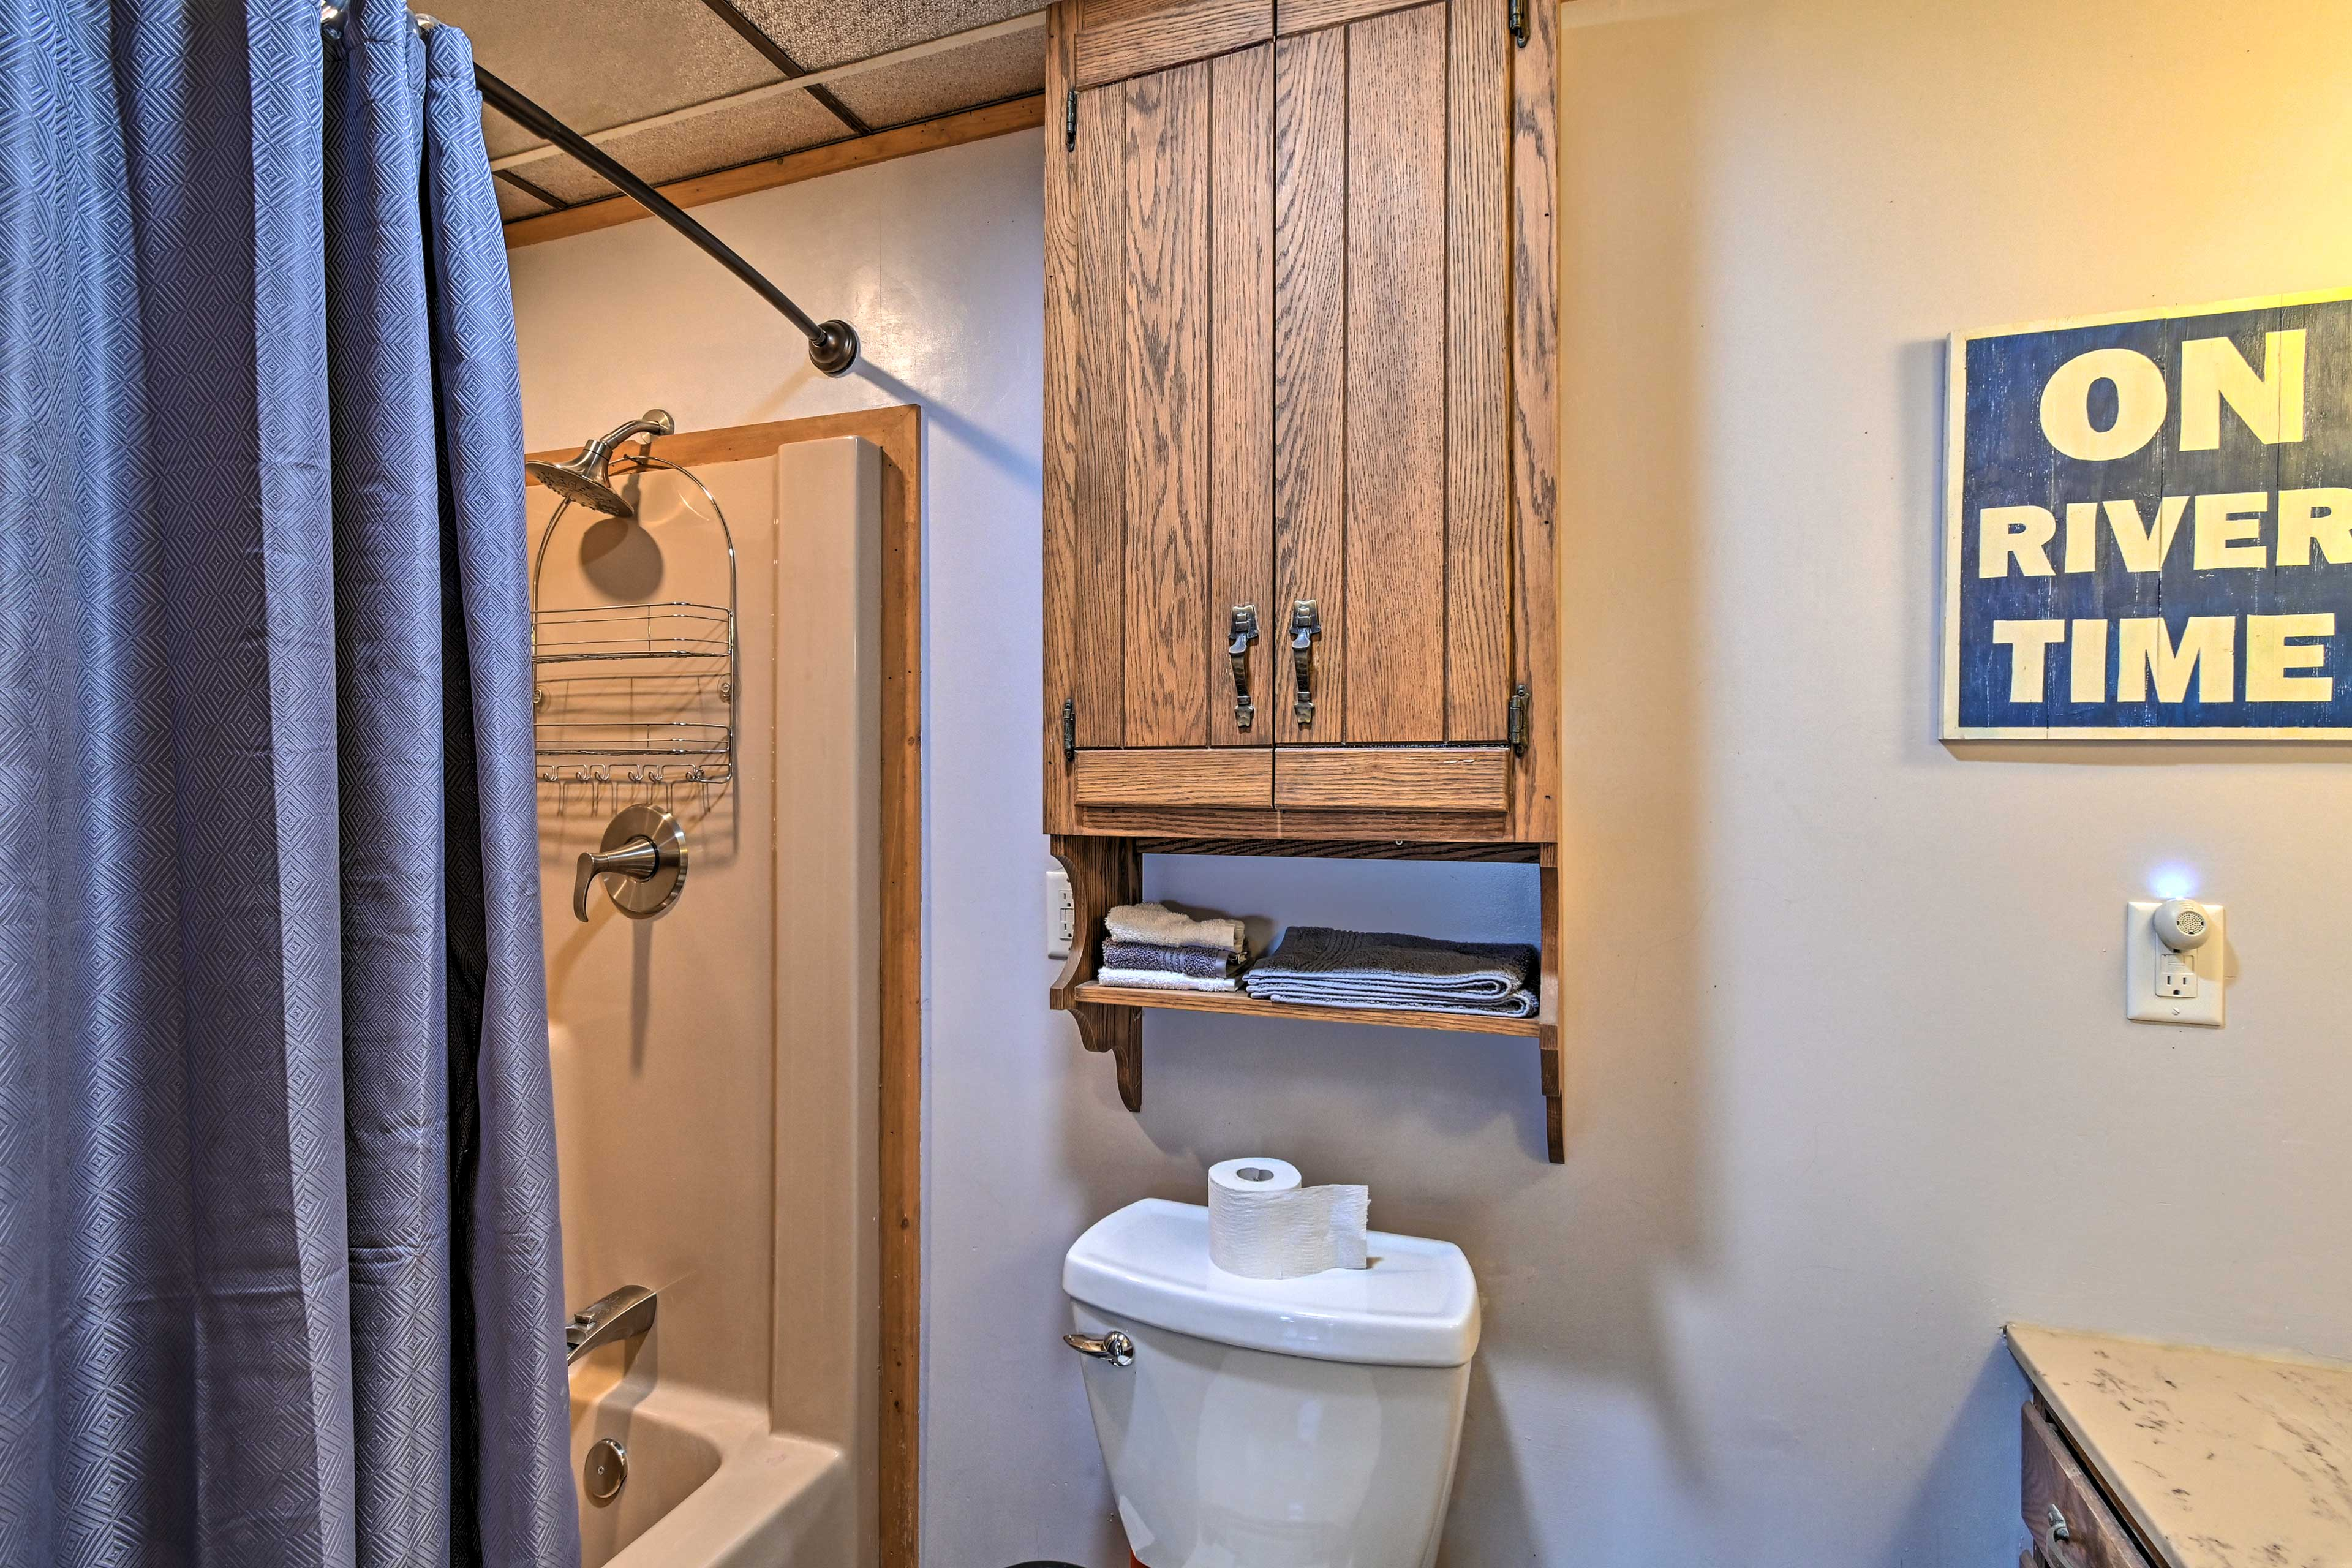 Full Bathroom | Towels Provided | Hair Dryer